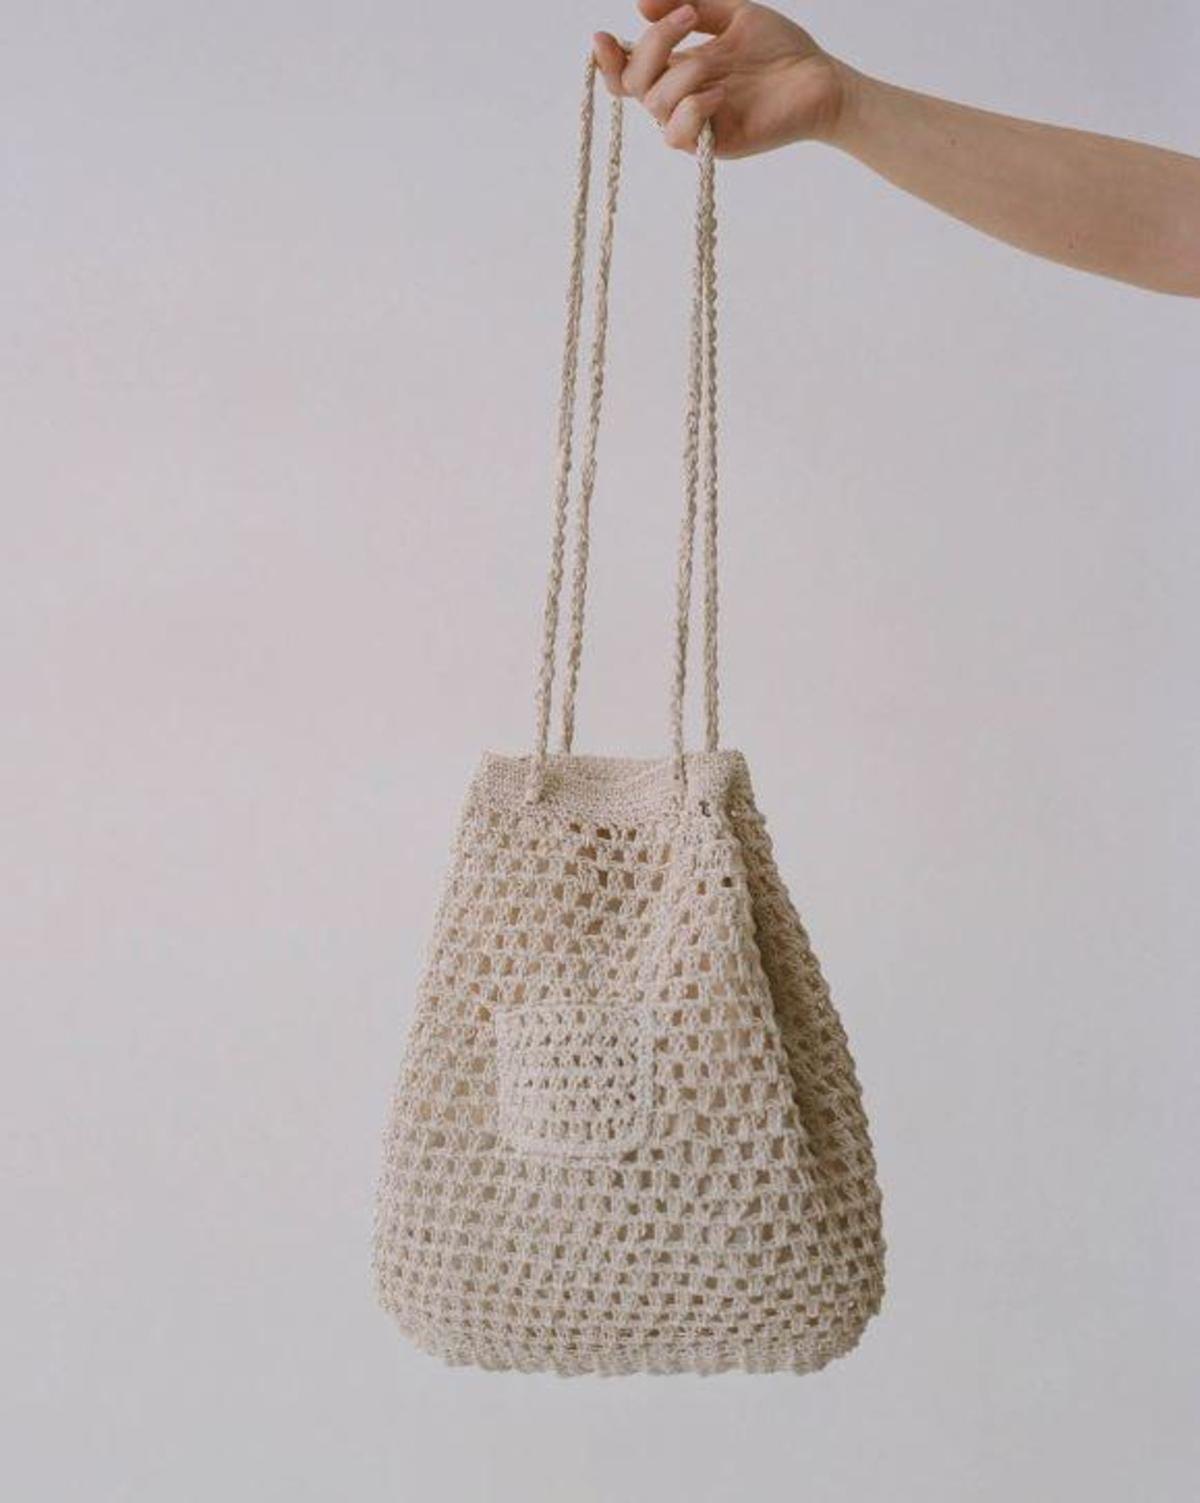 Paloma Wool Morgui Crochet Shoulder Bag Ecru Garmentory